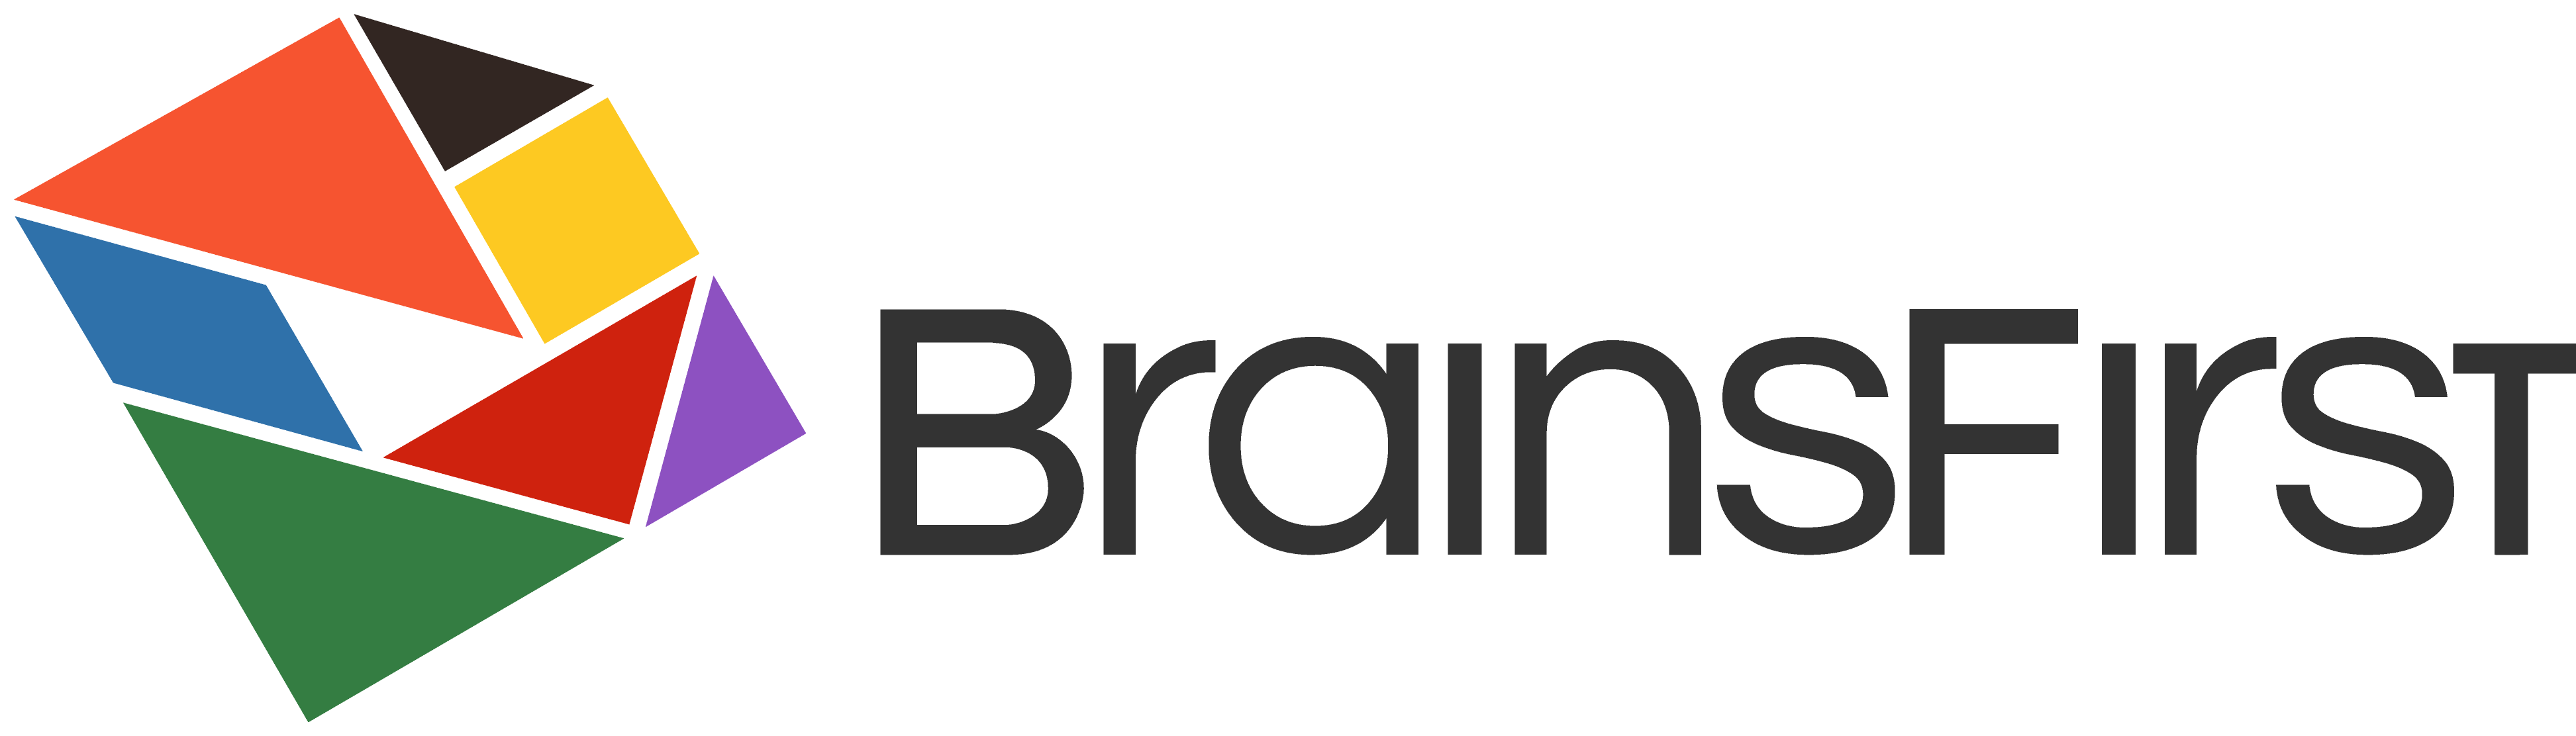 BrainsFirst BV